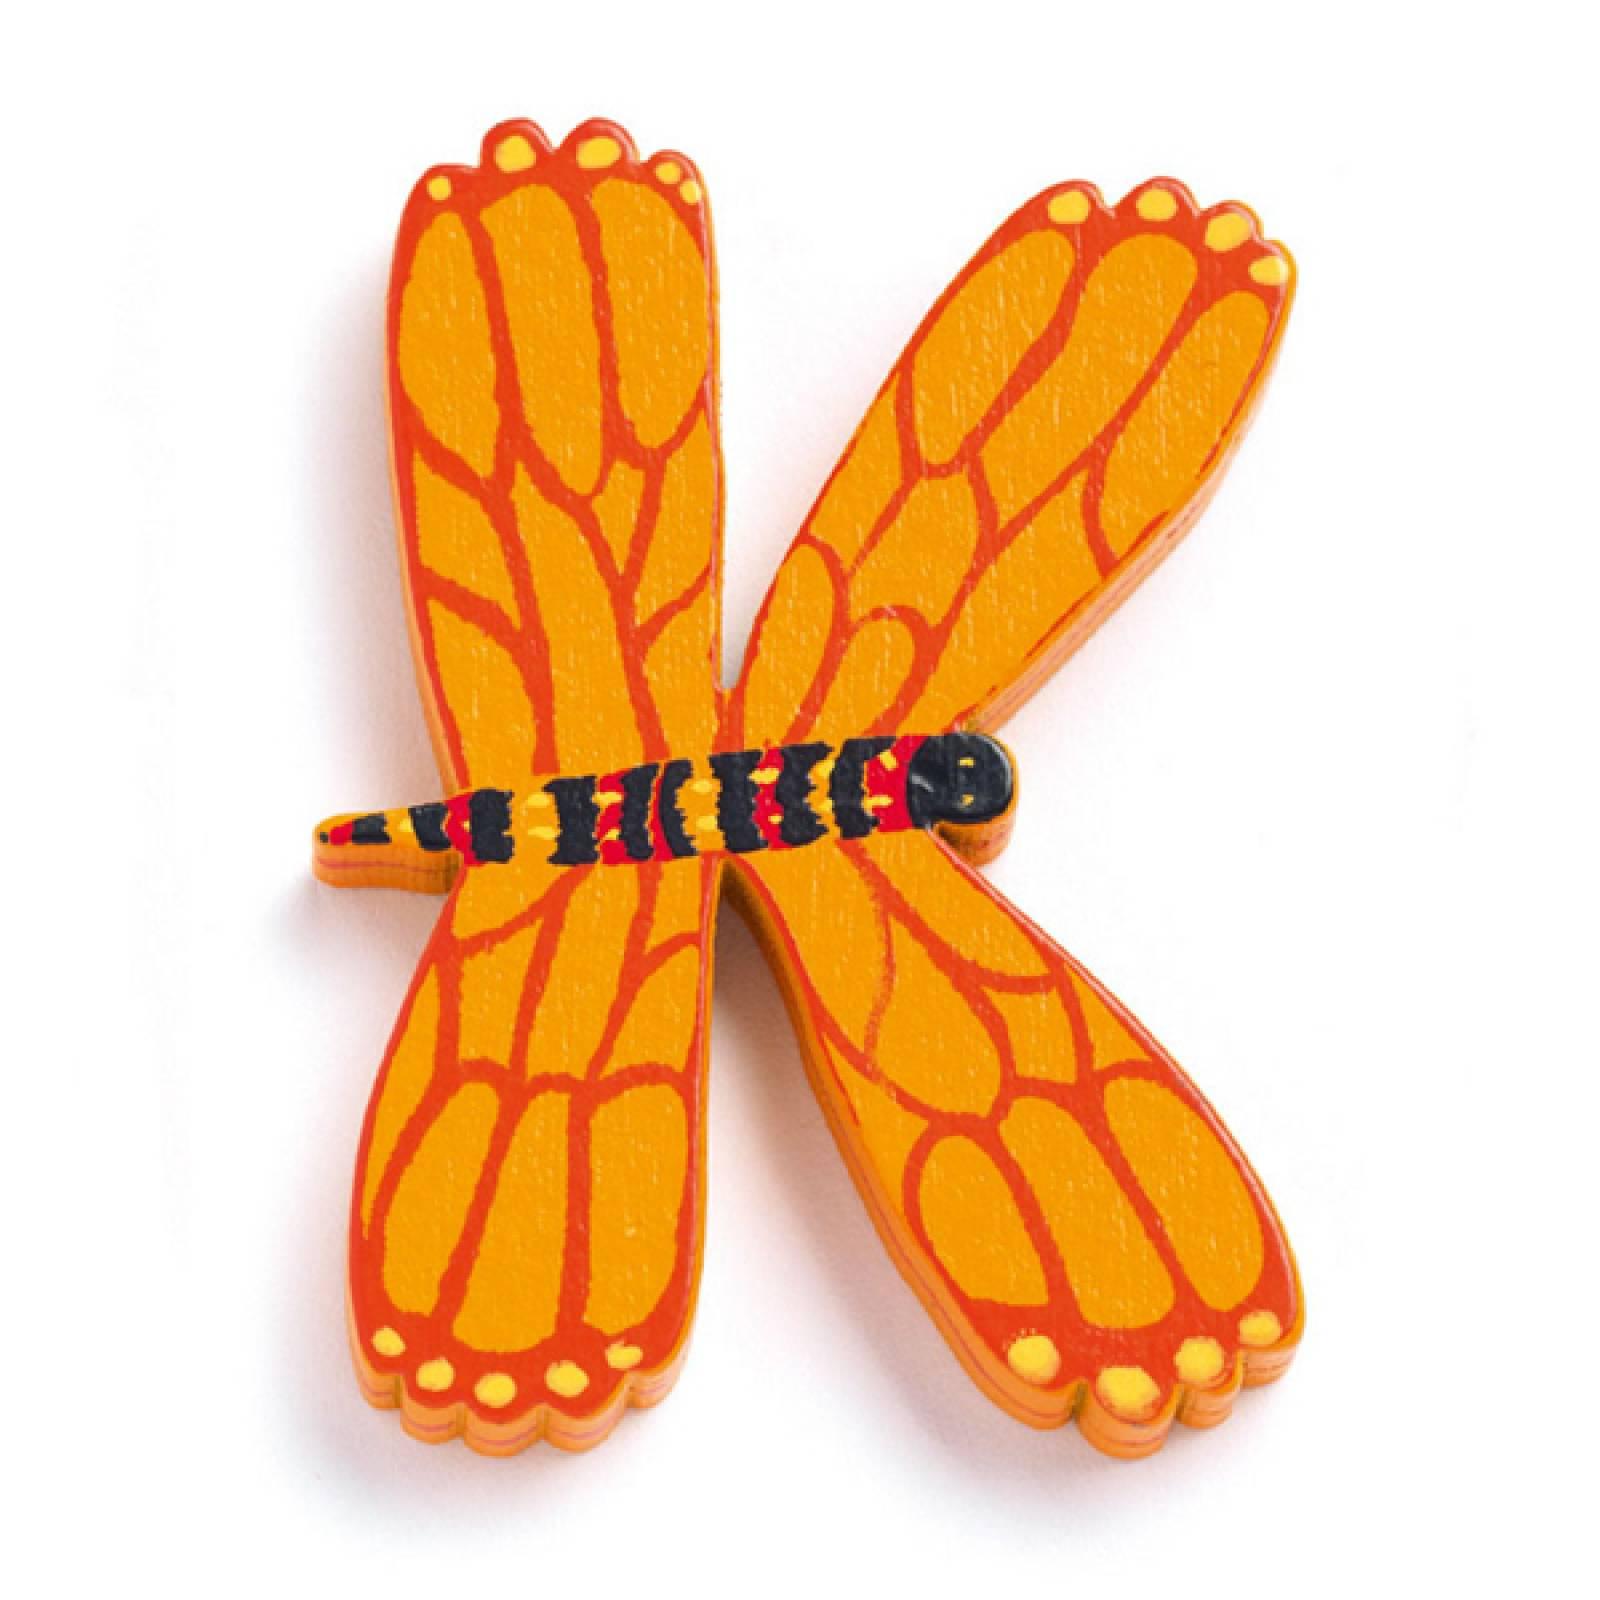 LETTER K - DJECO Animal Letter Decorative Alphabet Letter